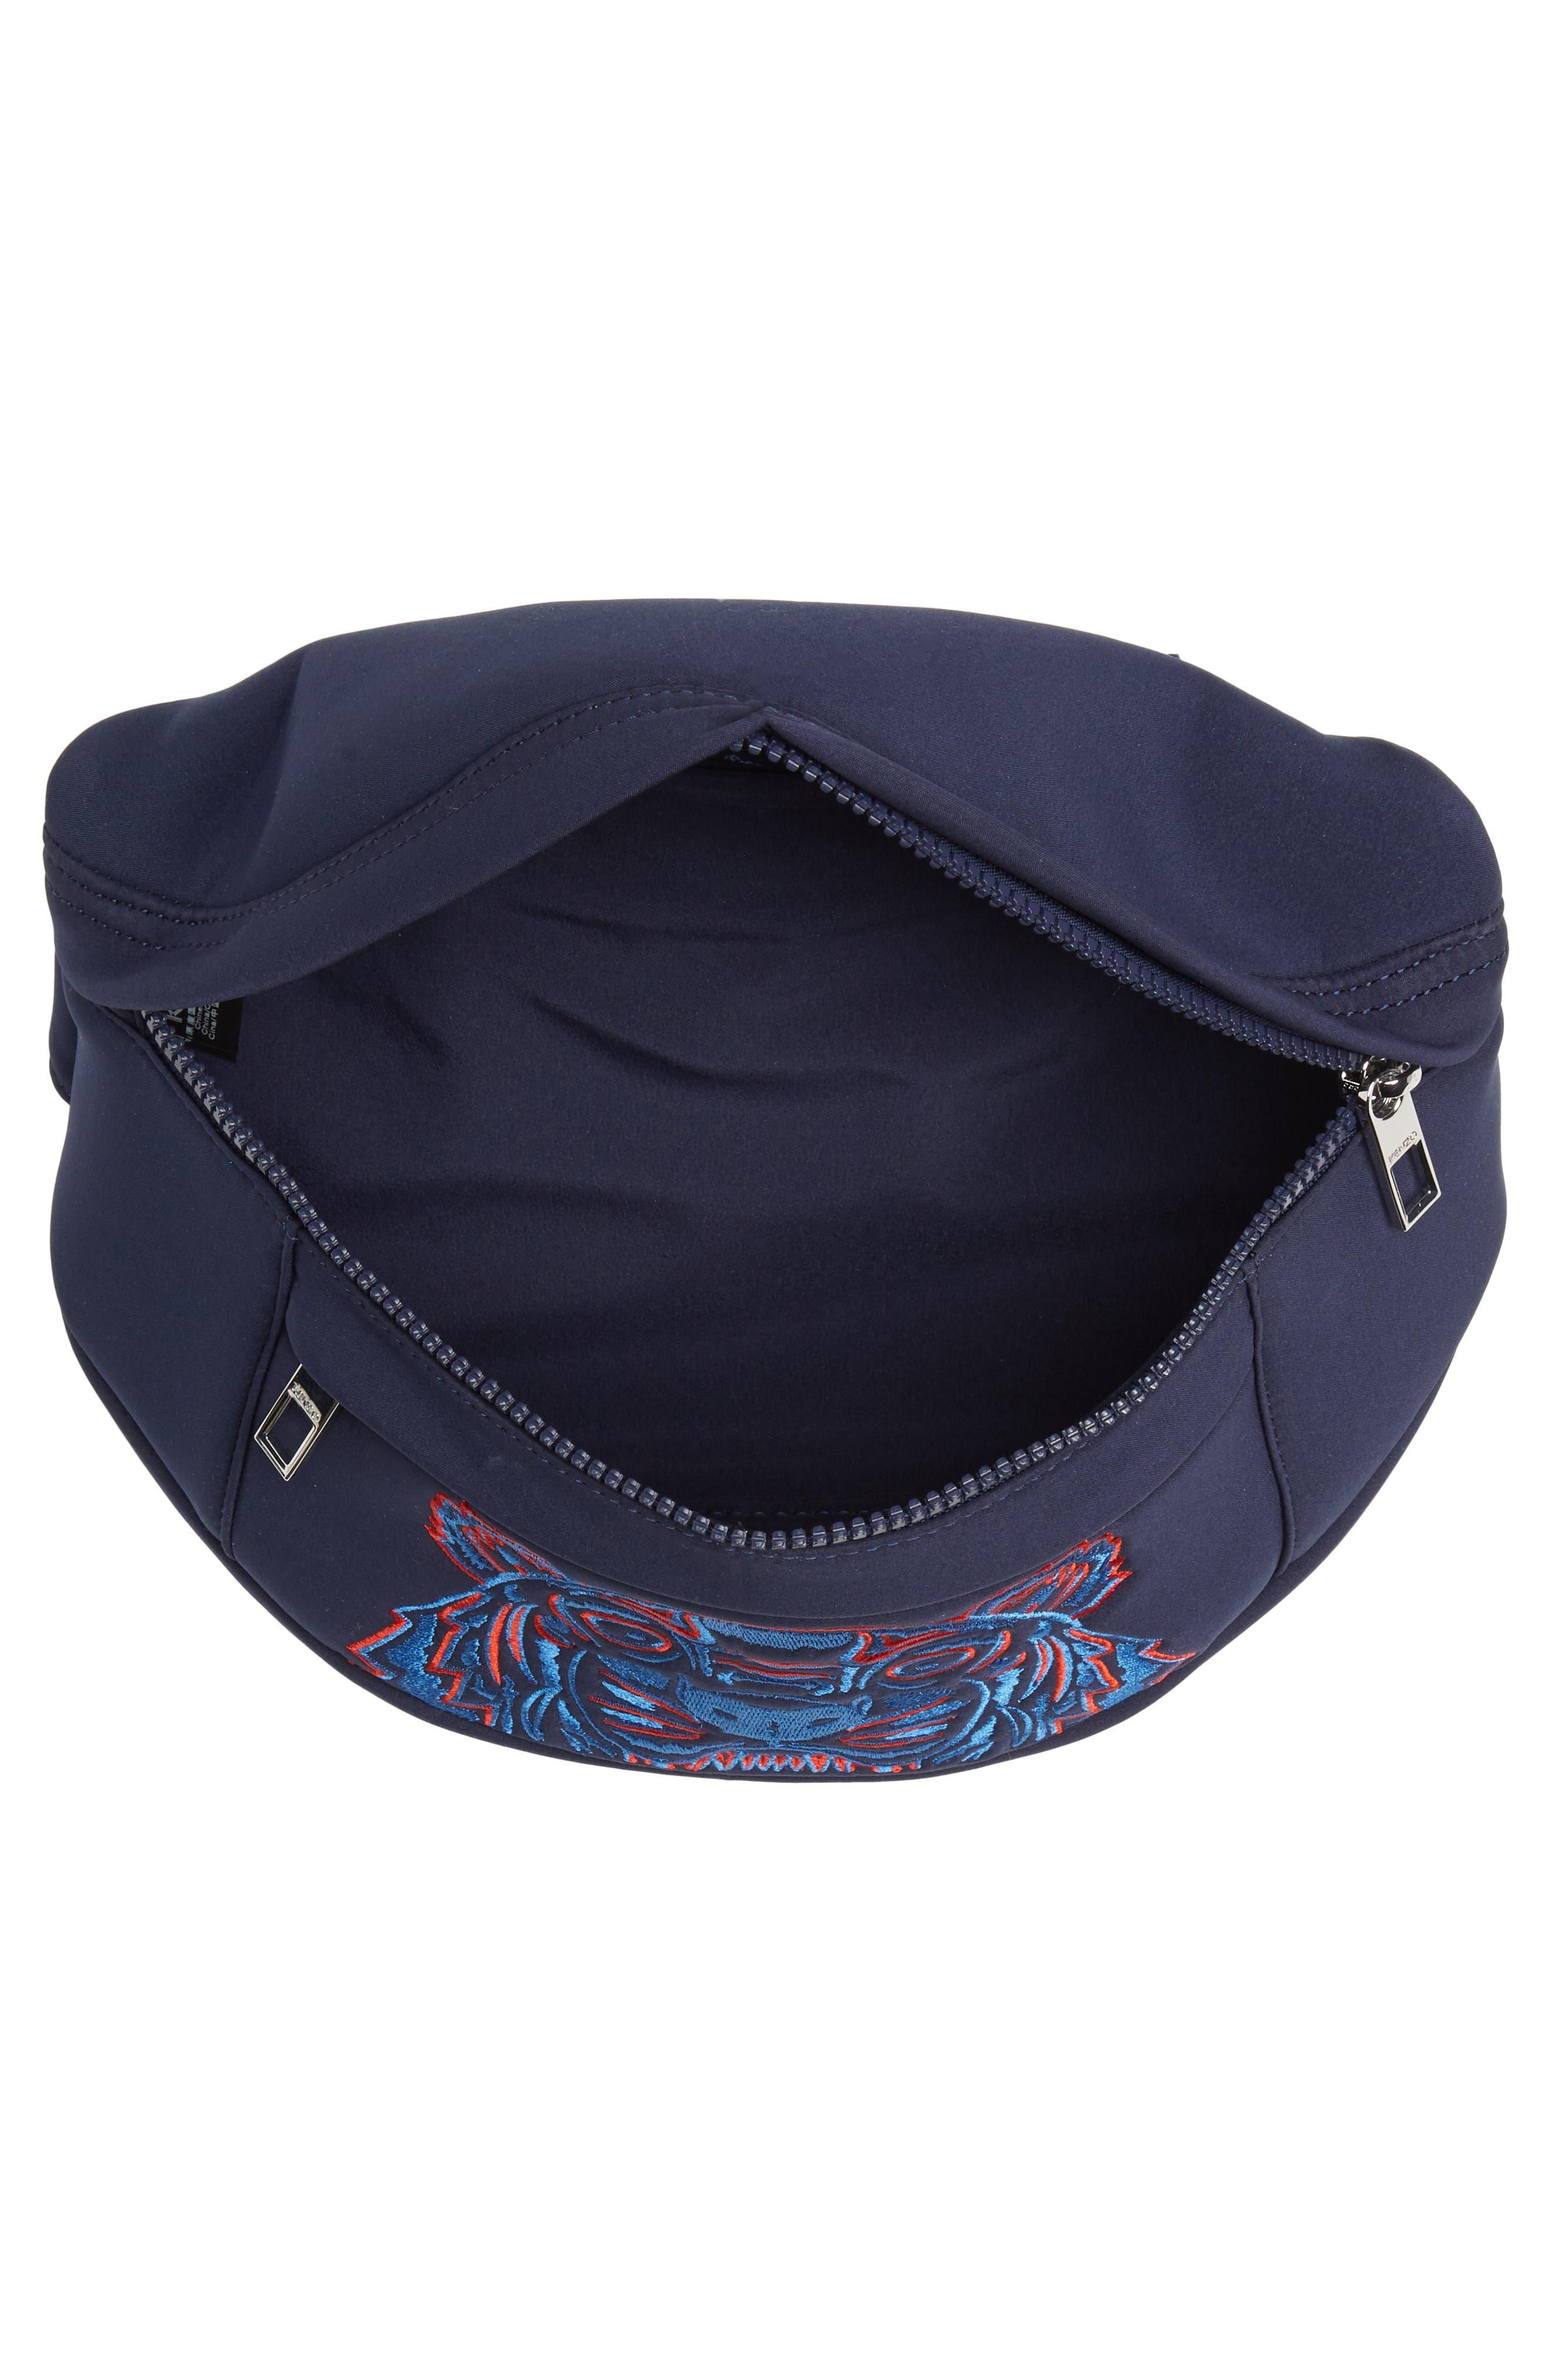 KENZO, Embroidered Tiger Belt Bag, Alternate thumbnail 5, color, 76A NAVY BLUE